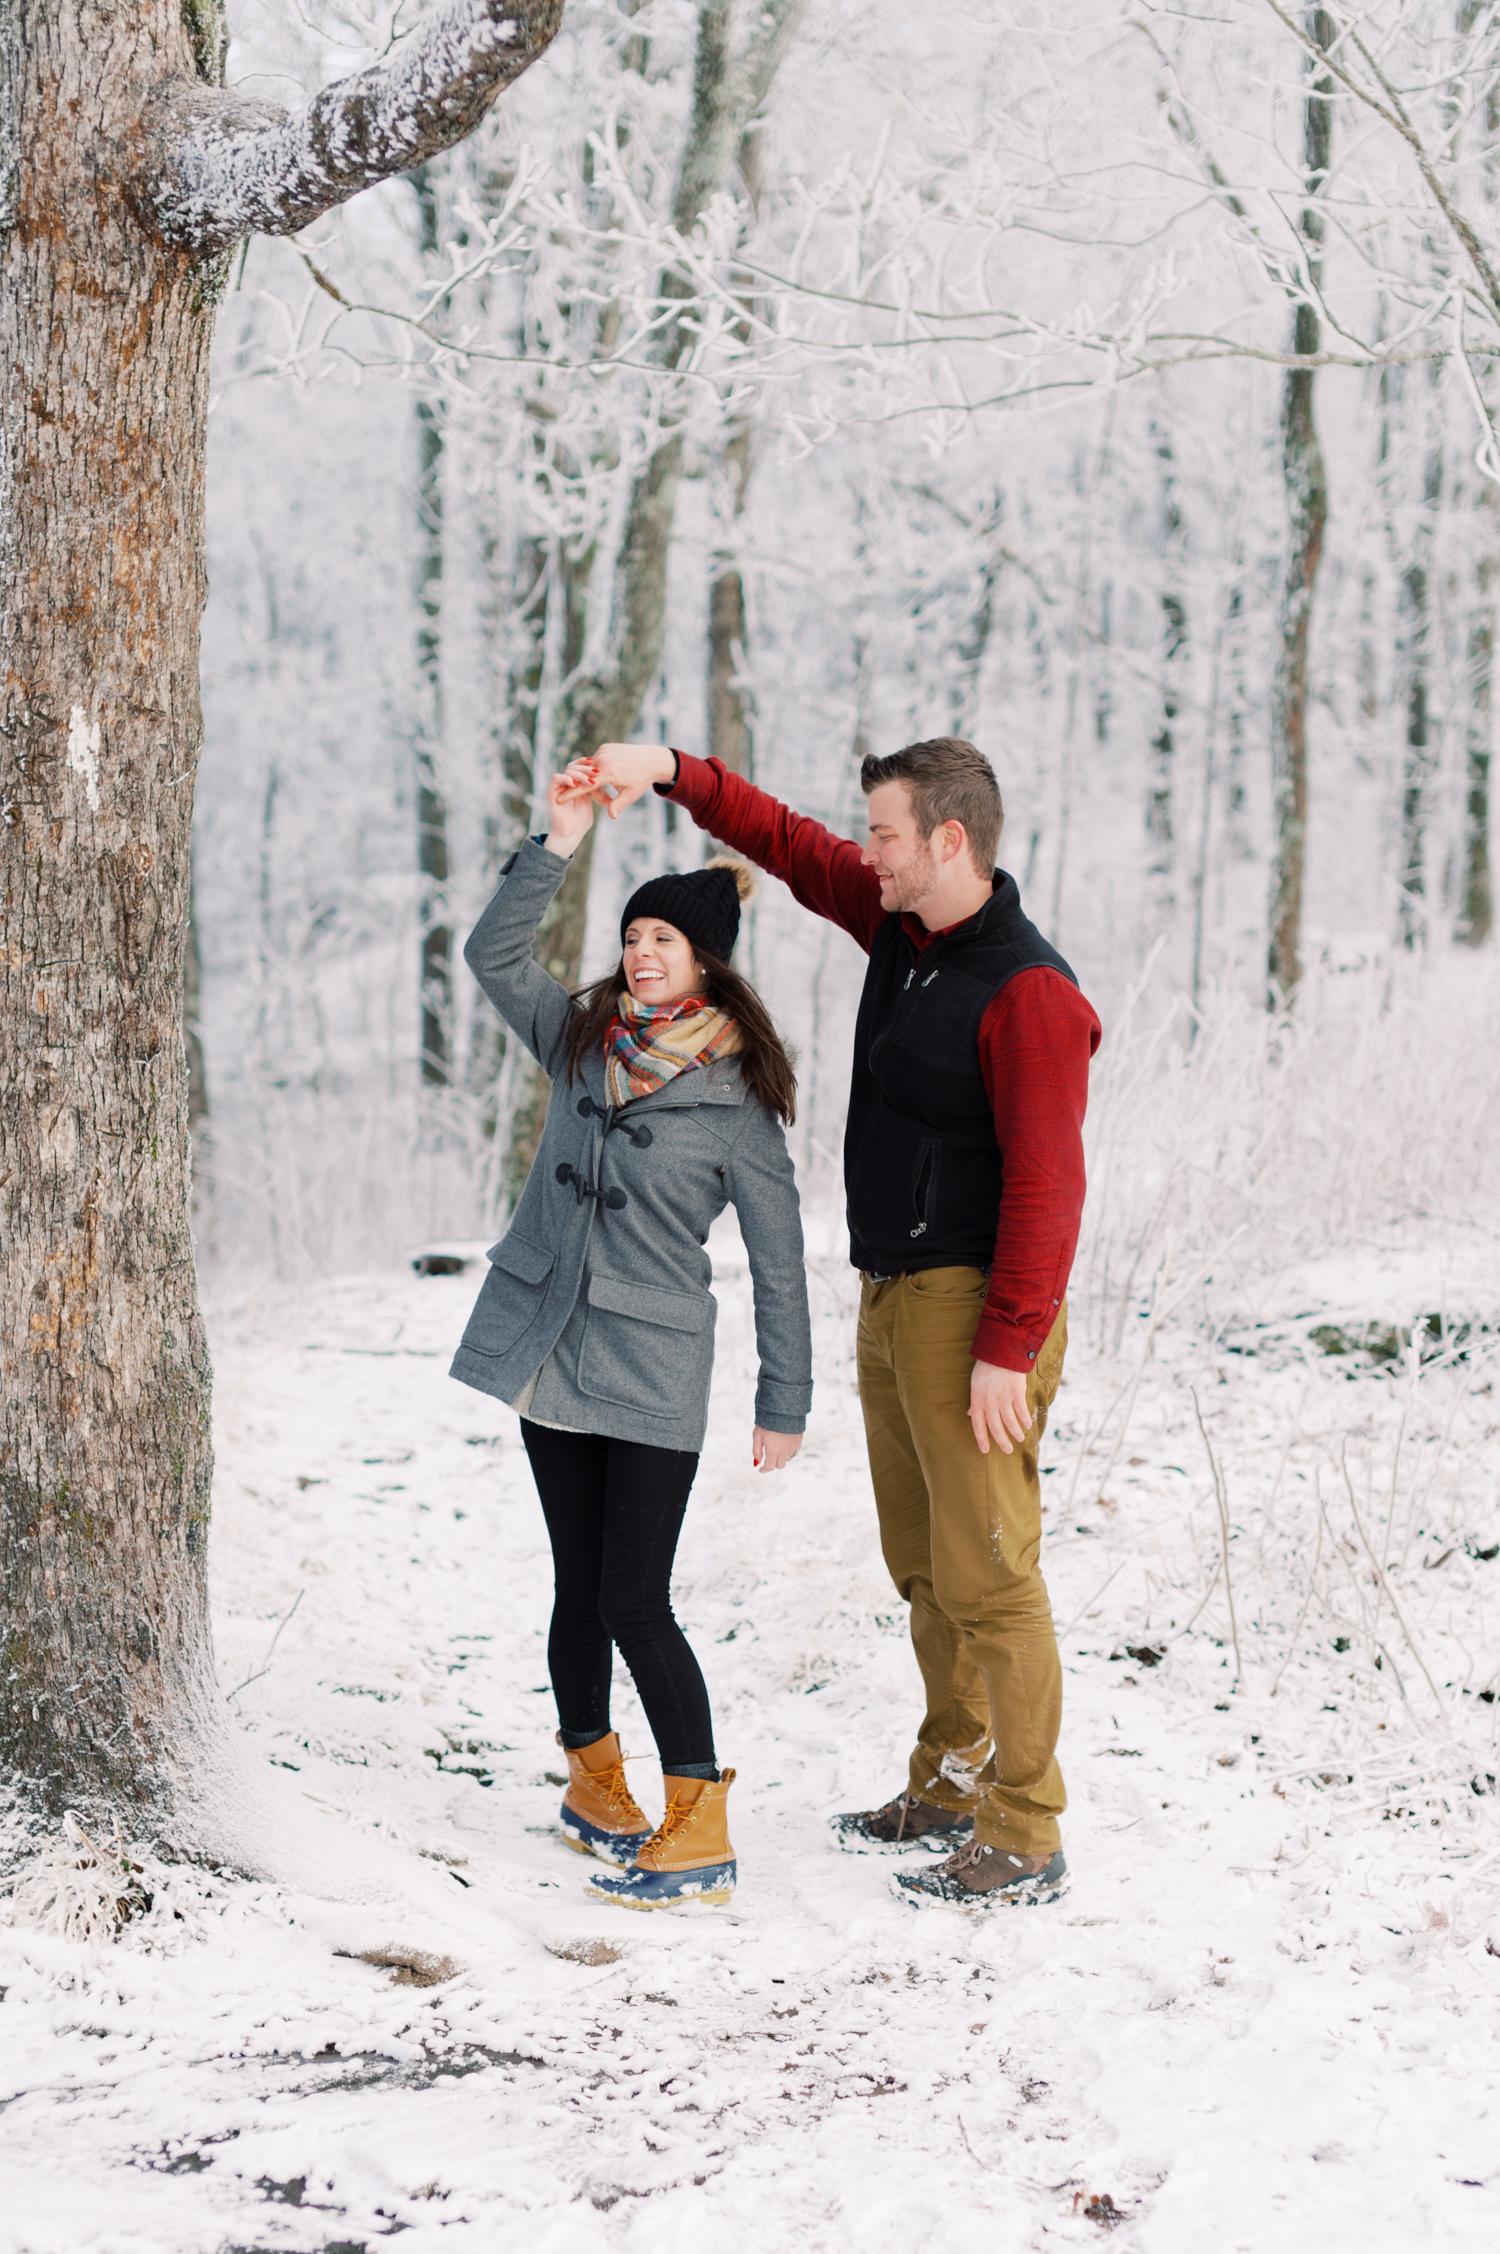 snowy-georgia-proposal-preachers-rock-atlanta-dahlonega-wedding-photographer-hannah-forsberg-fine-art-film-2.jpg